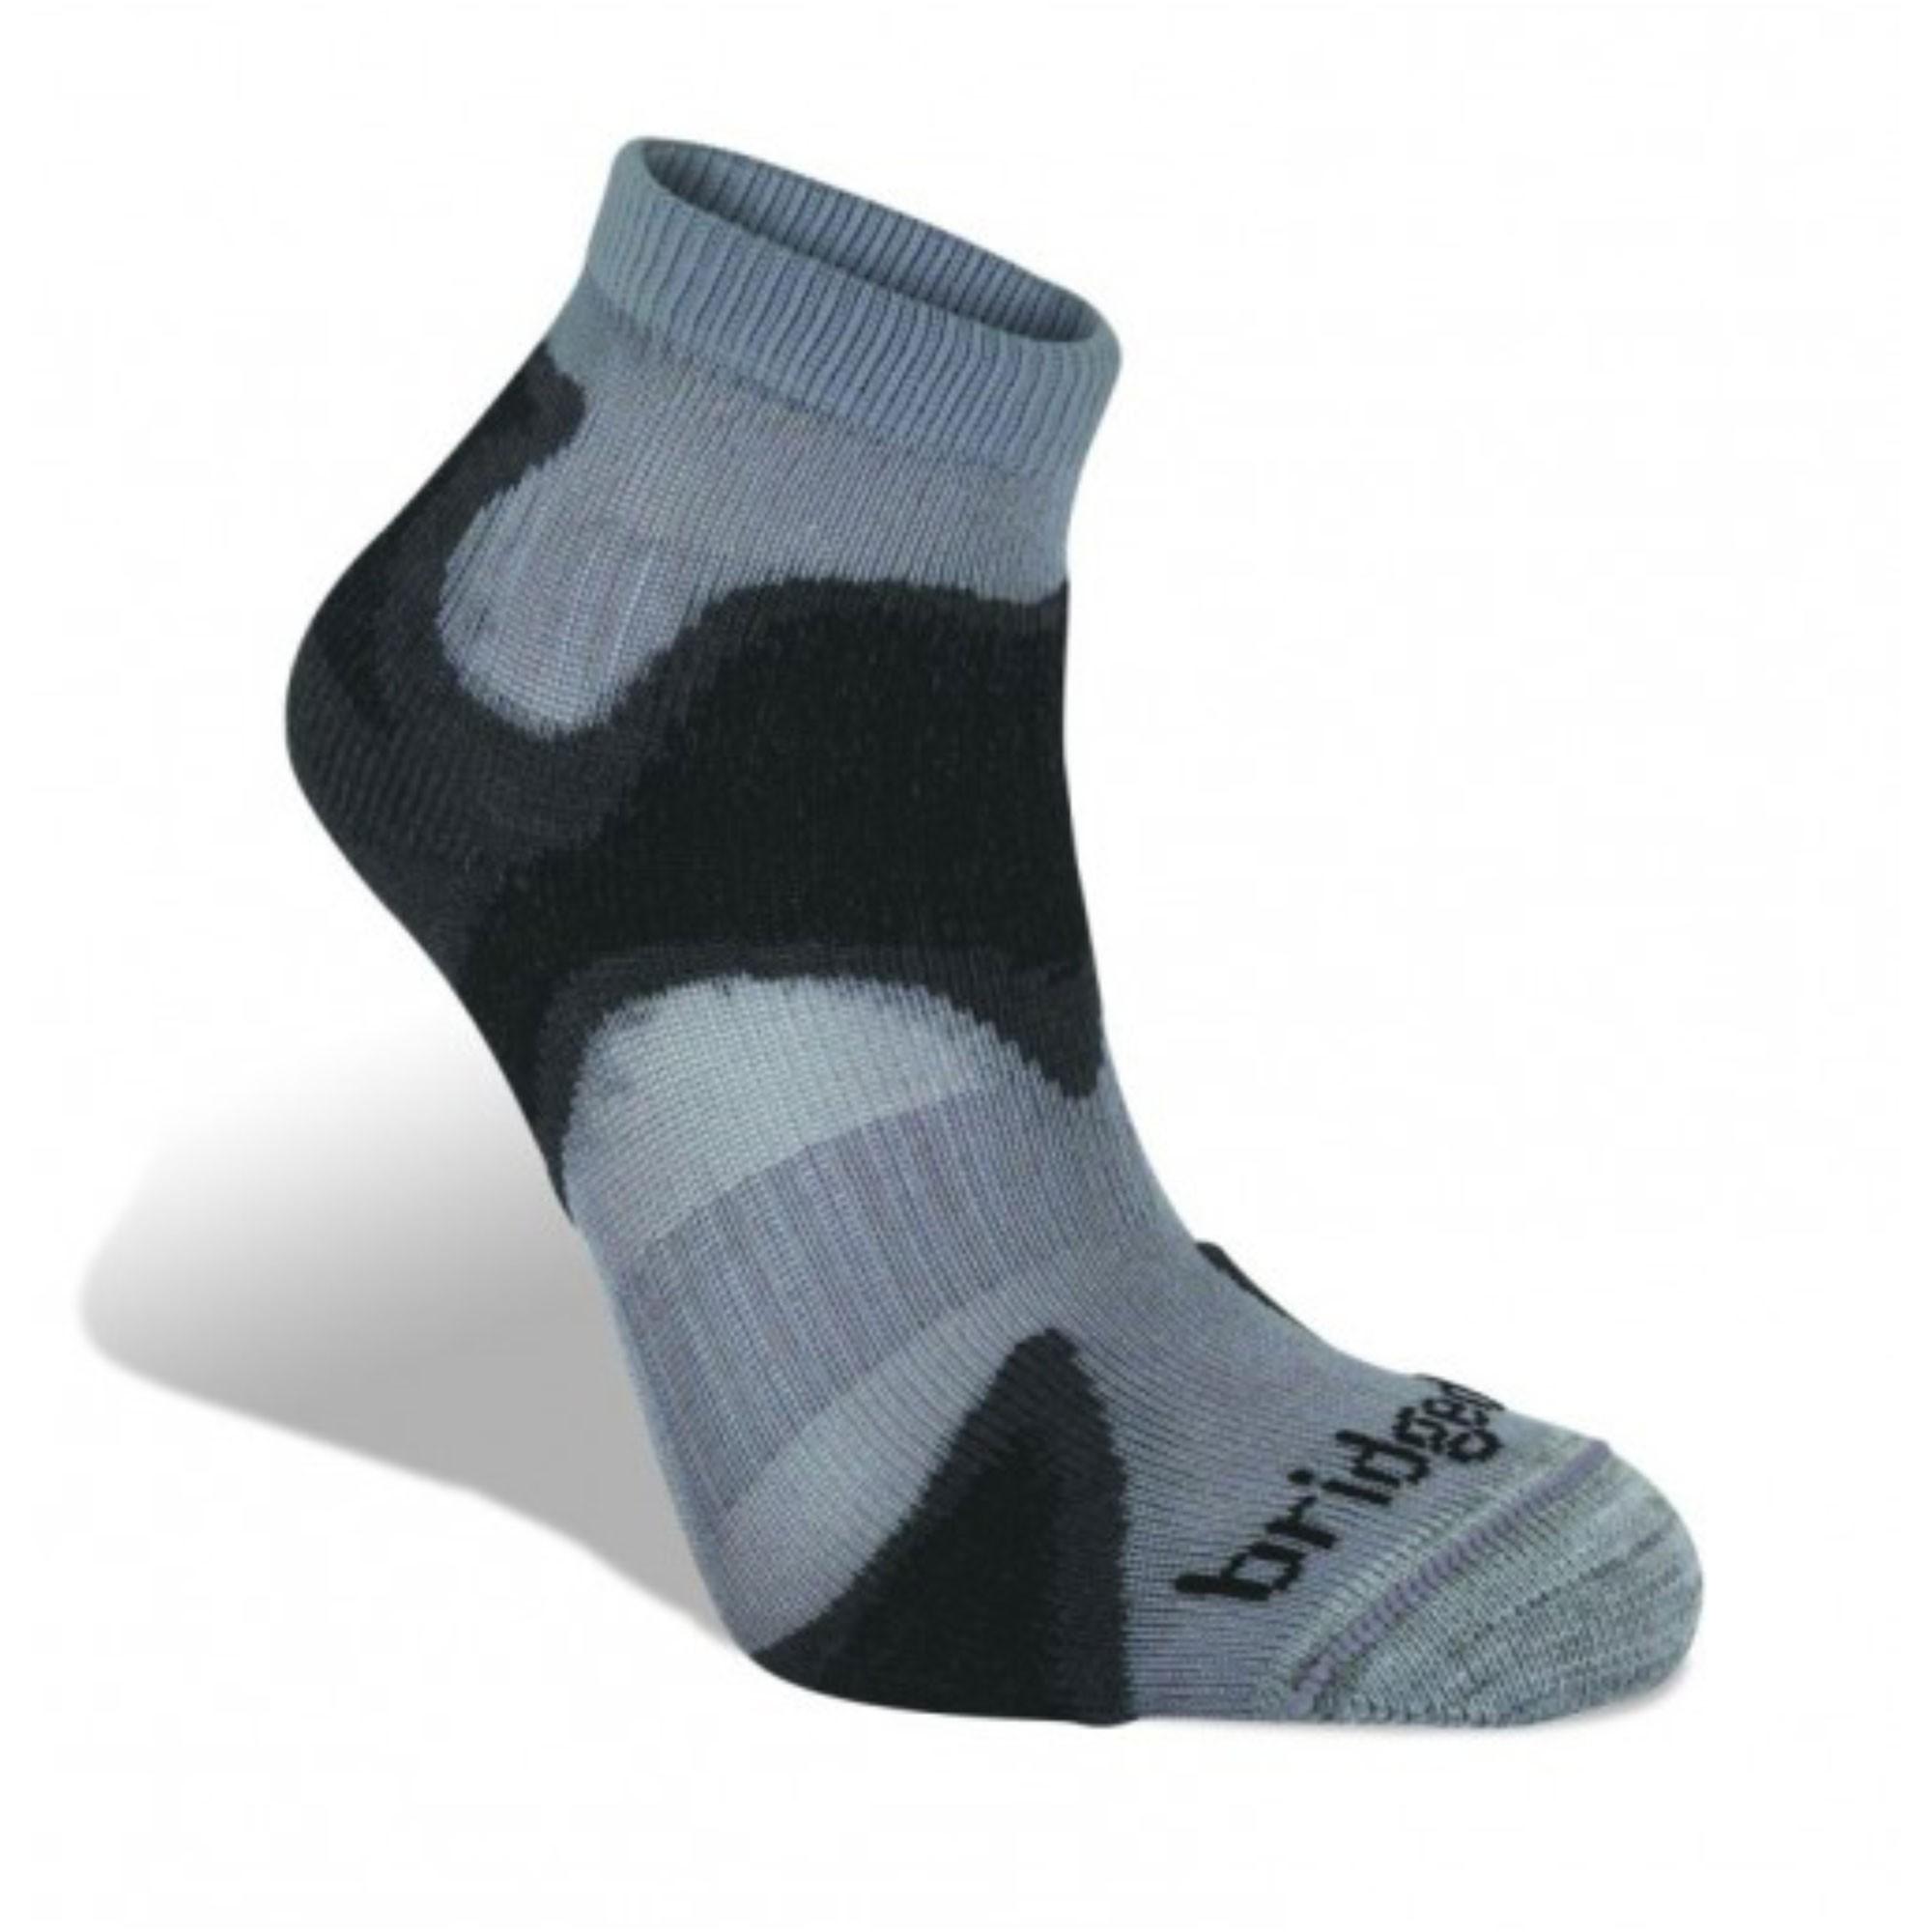 BRIDGEDALE - Speed Demon Socks - Gunmetal/Black